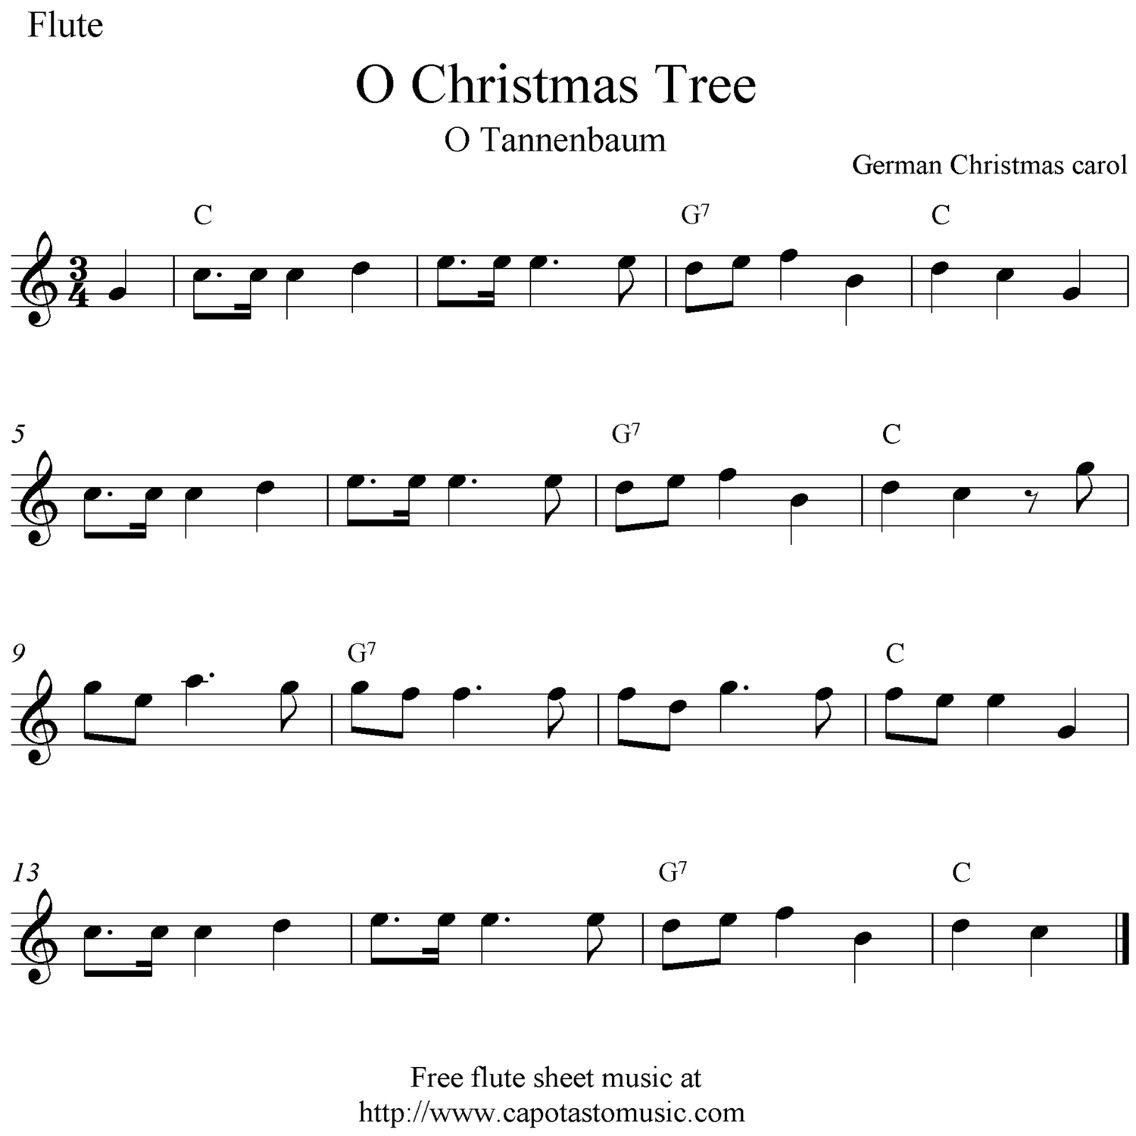 Oh Christmas tree flute music | Flute | Pinterest | Flutes